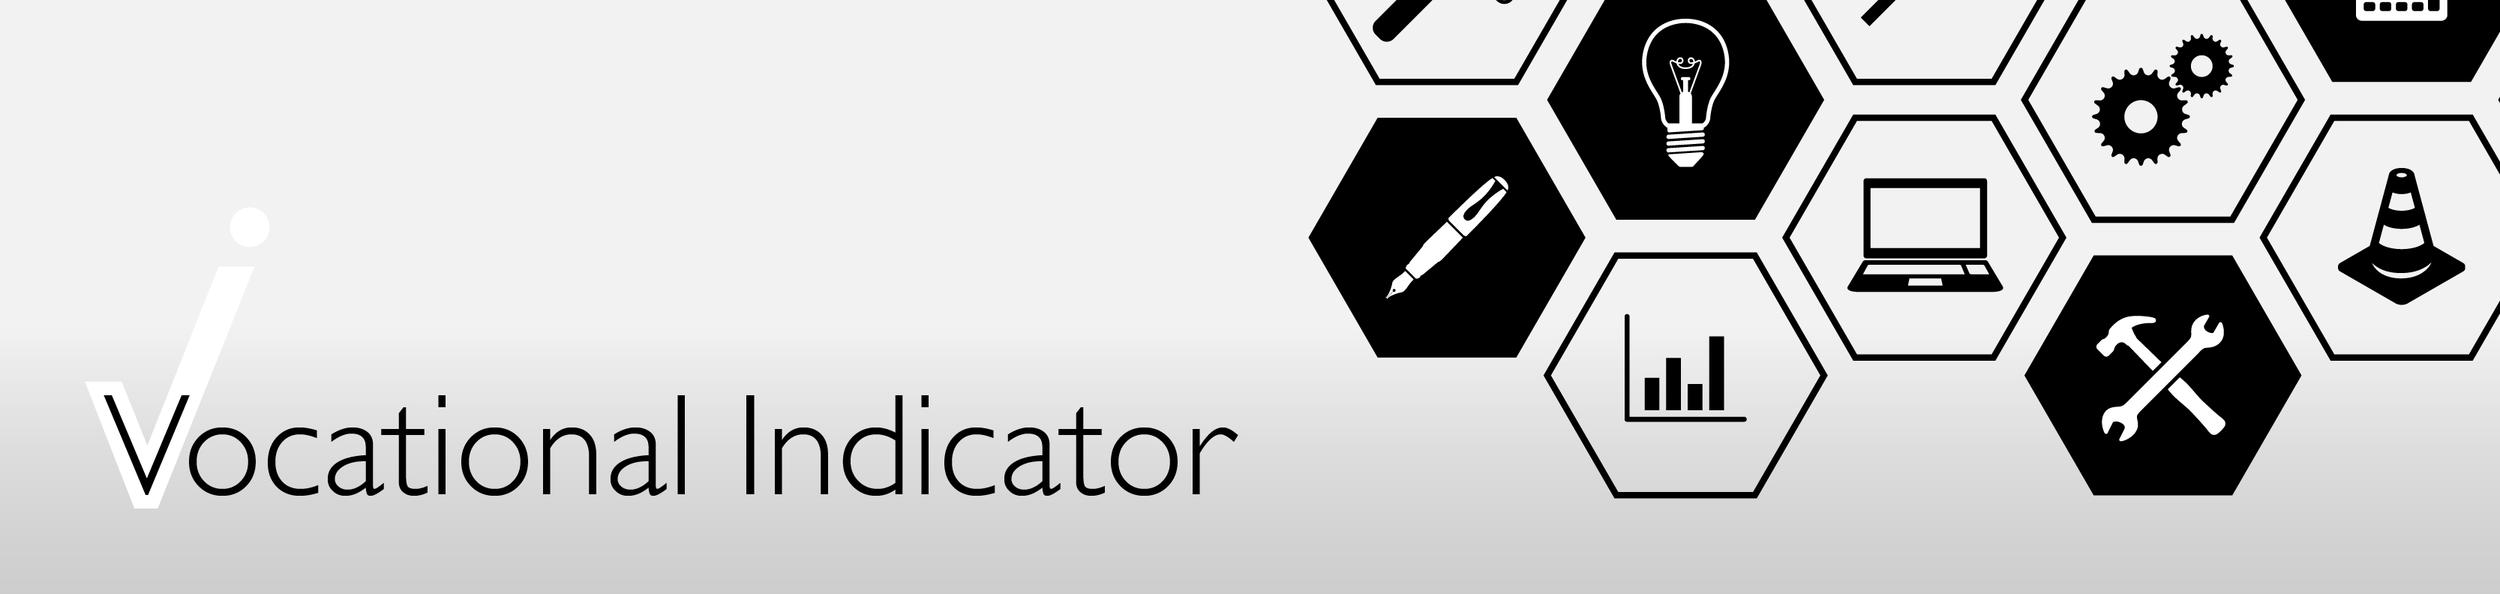 VocationalIndicator-Creative- final.png